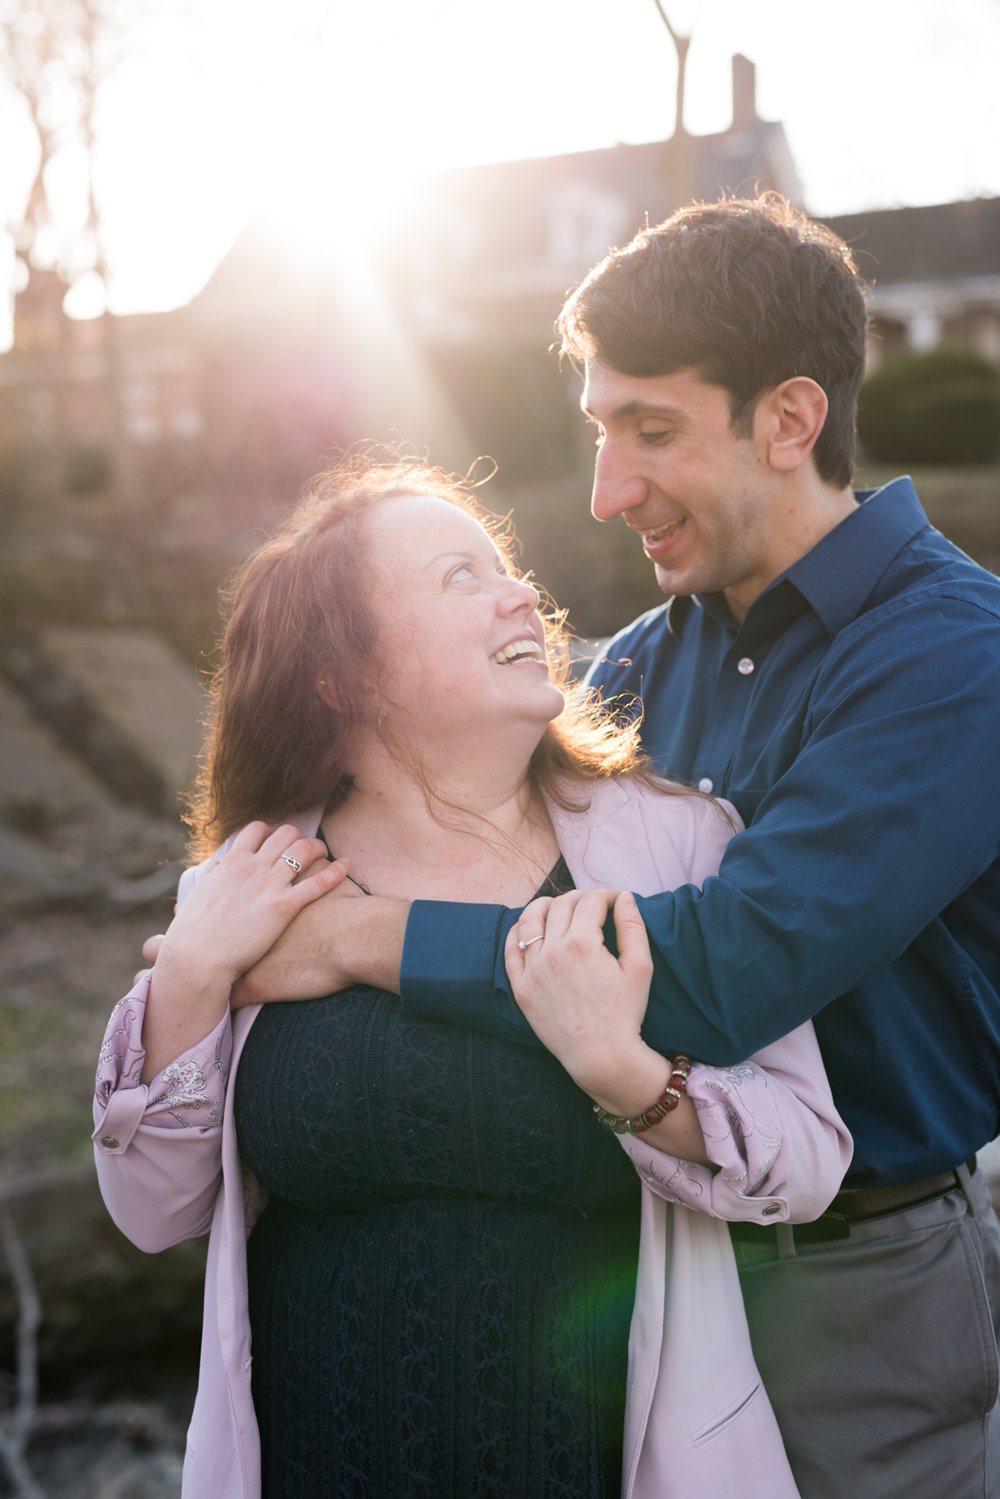 Kelsey+Bill- Sunset Engagement Session-Kingsland Park Nutely- Olivia Christina Photo-49.JPG